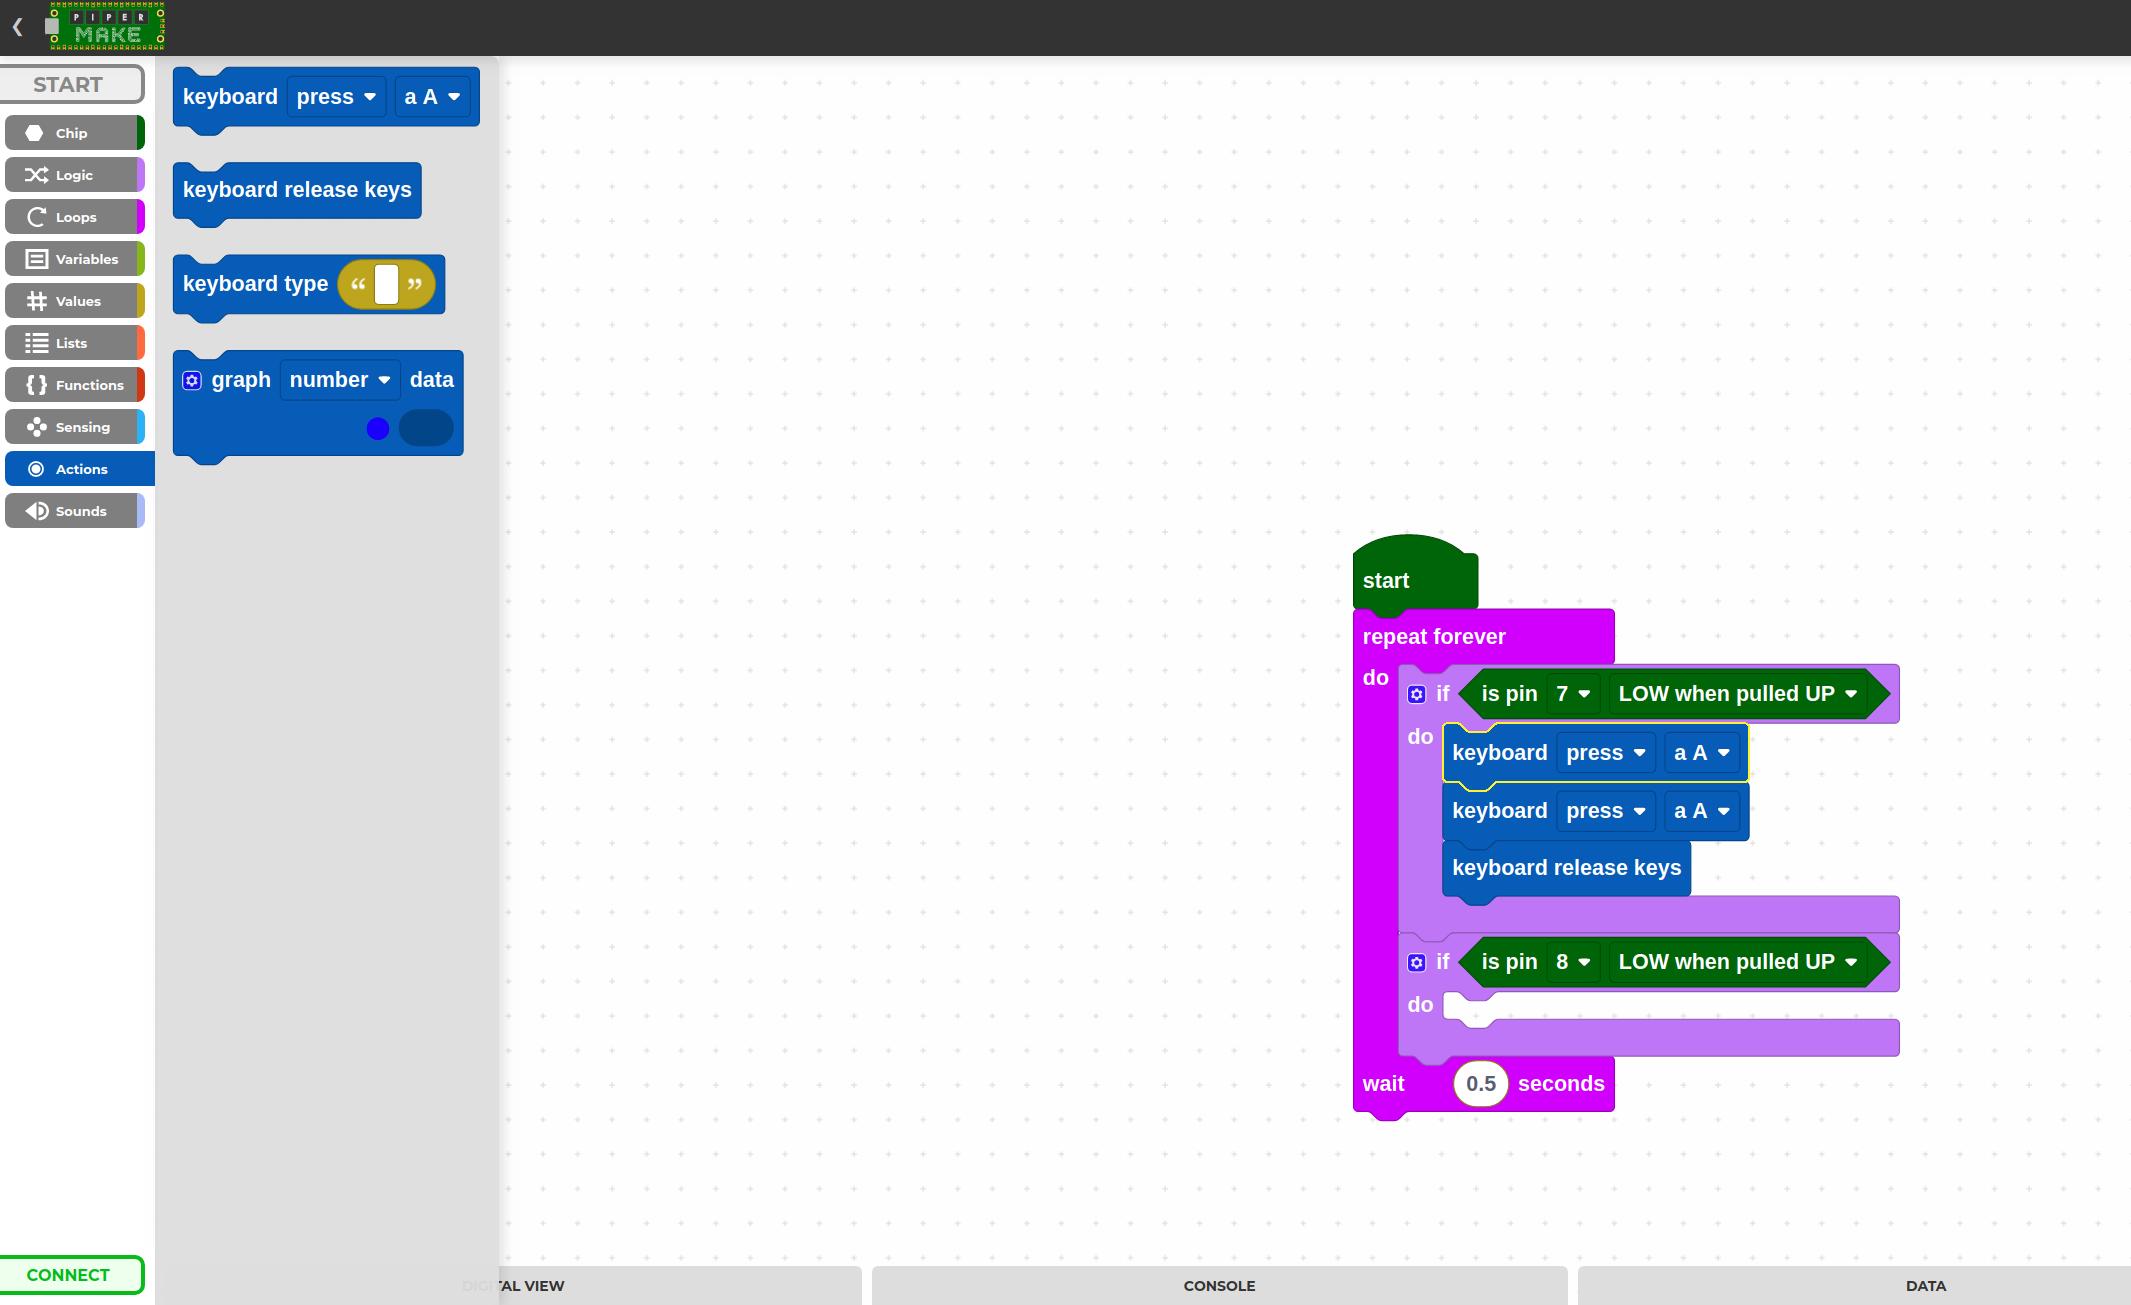 raspberry_pi_Screenshot_from_2021-03-24_16-48-25.png